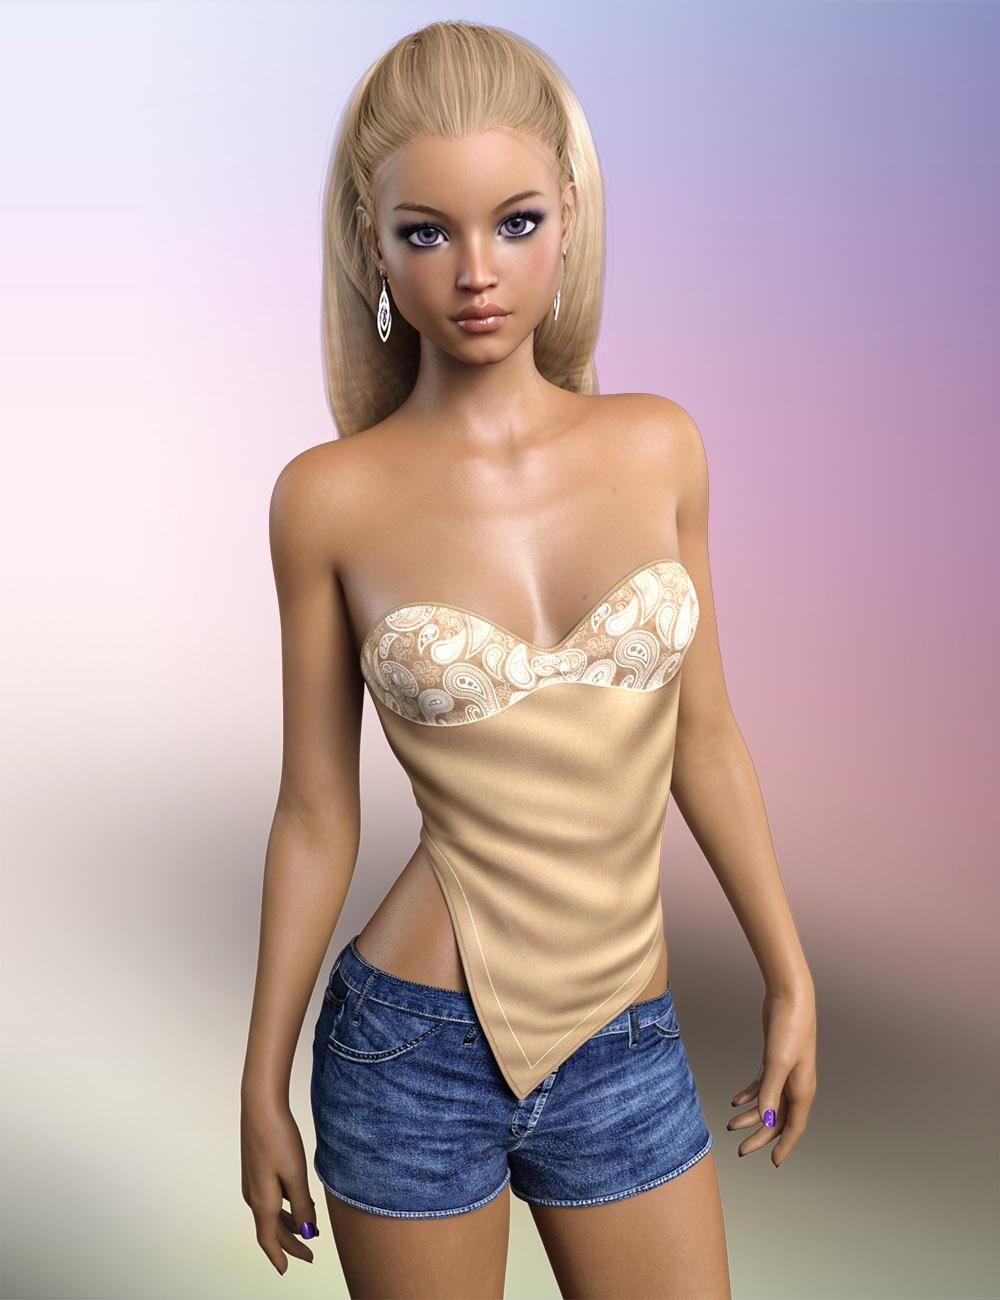 FWSA Sparkle for Mika 7 by: Fisty & DarcFred Winkler ArtSabby, 3D Models by Daz 3D